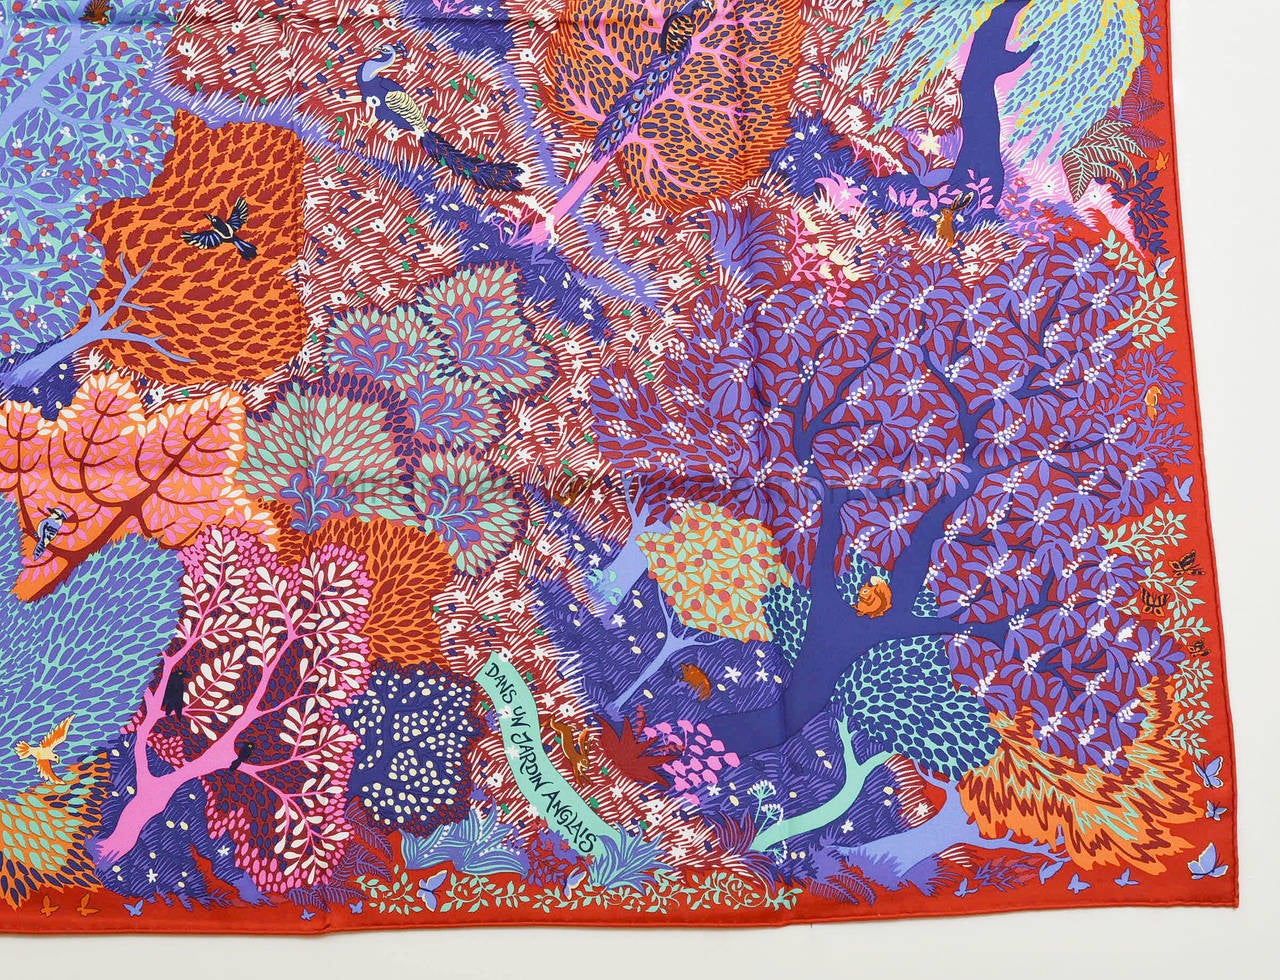 Hermes carre twill dans un jardin anglais silk red purple Dans un jardin anglais hermes